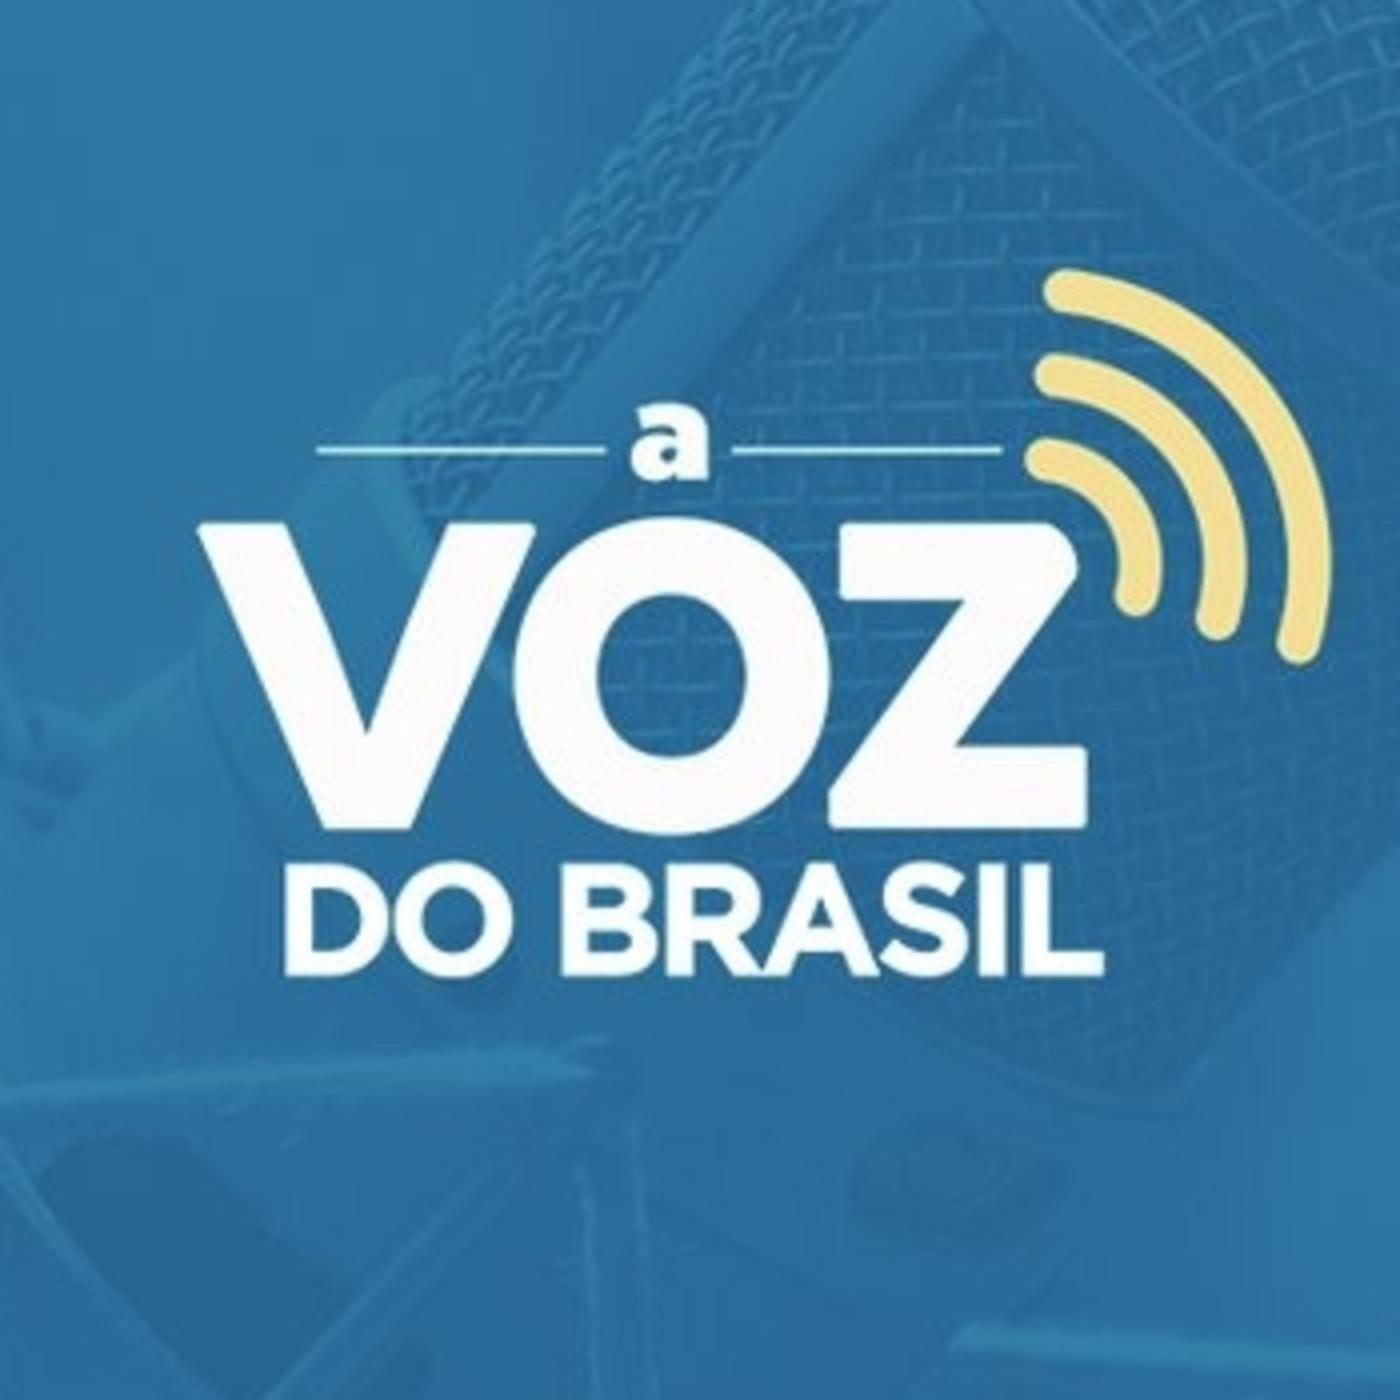 A Voz do Brasil 2019-02-13